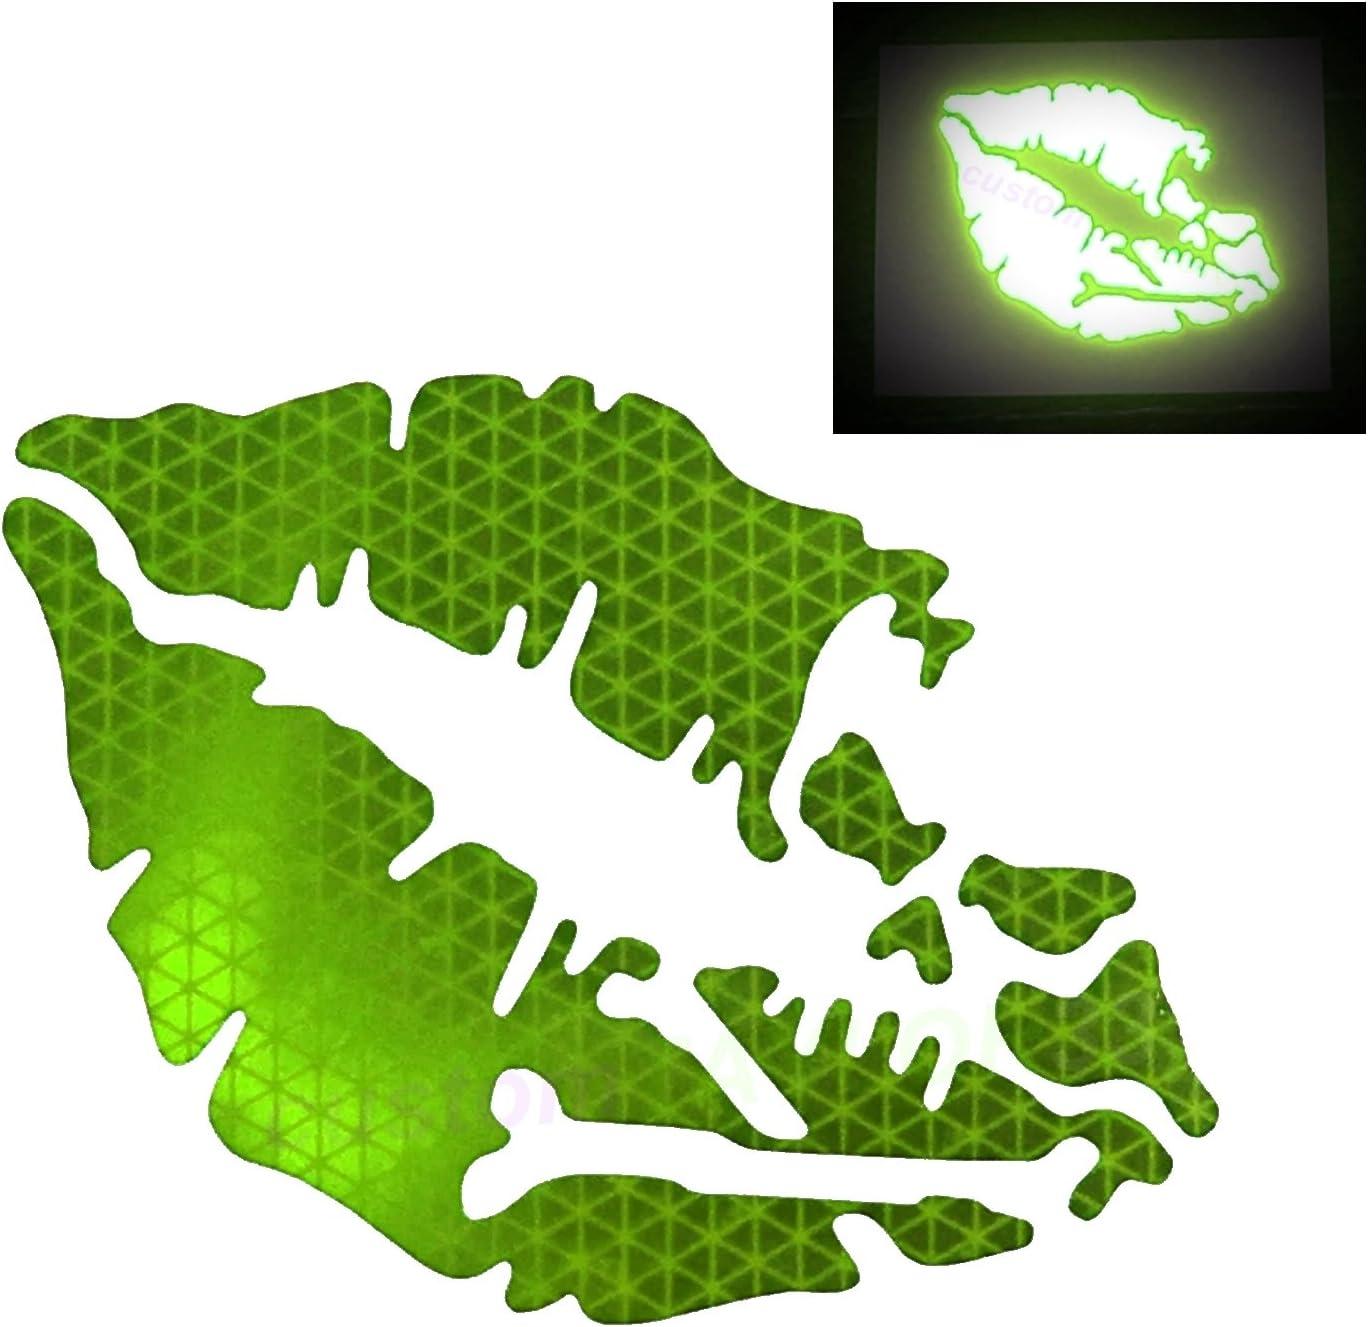 customTAYLOR33 High Intensity Reflective Vinyl Death Kiss Skull Crossbones Lips Decal Bumper Sticker - Cars, Motorcycles, Helmets, Wind Screens, laptops, cellphones, (SE Lime Green, 6 inch Wide)